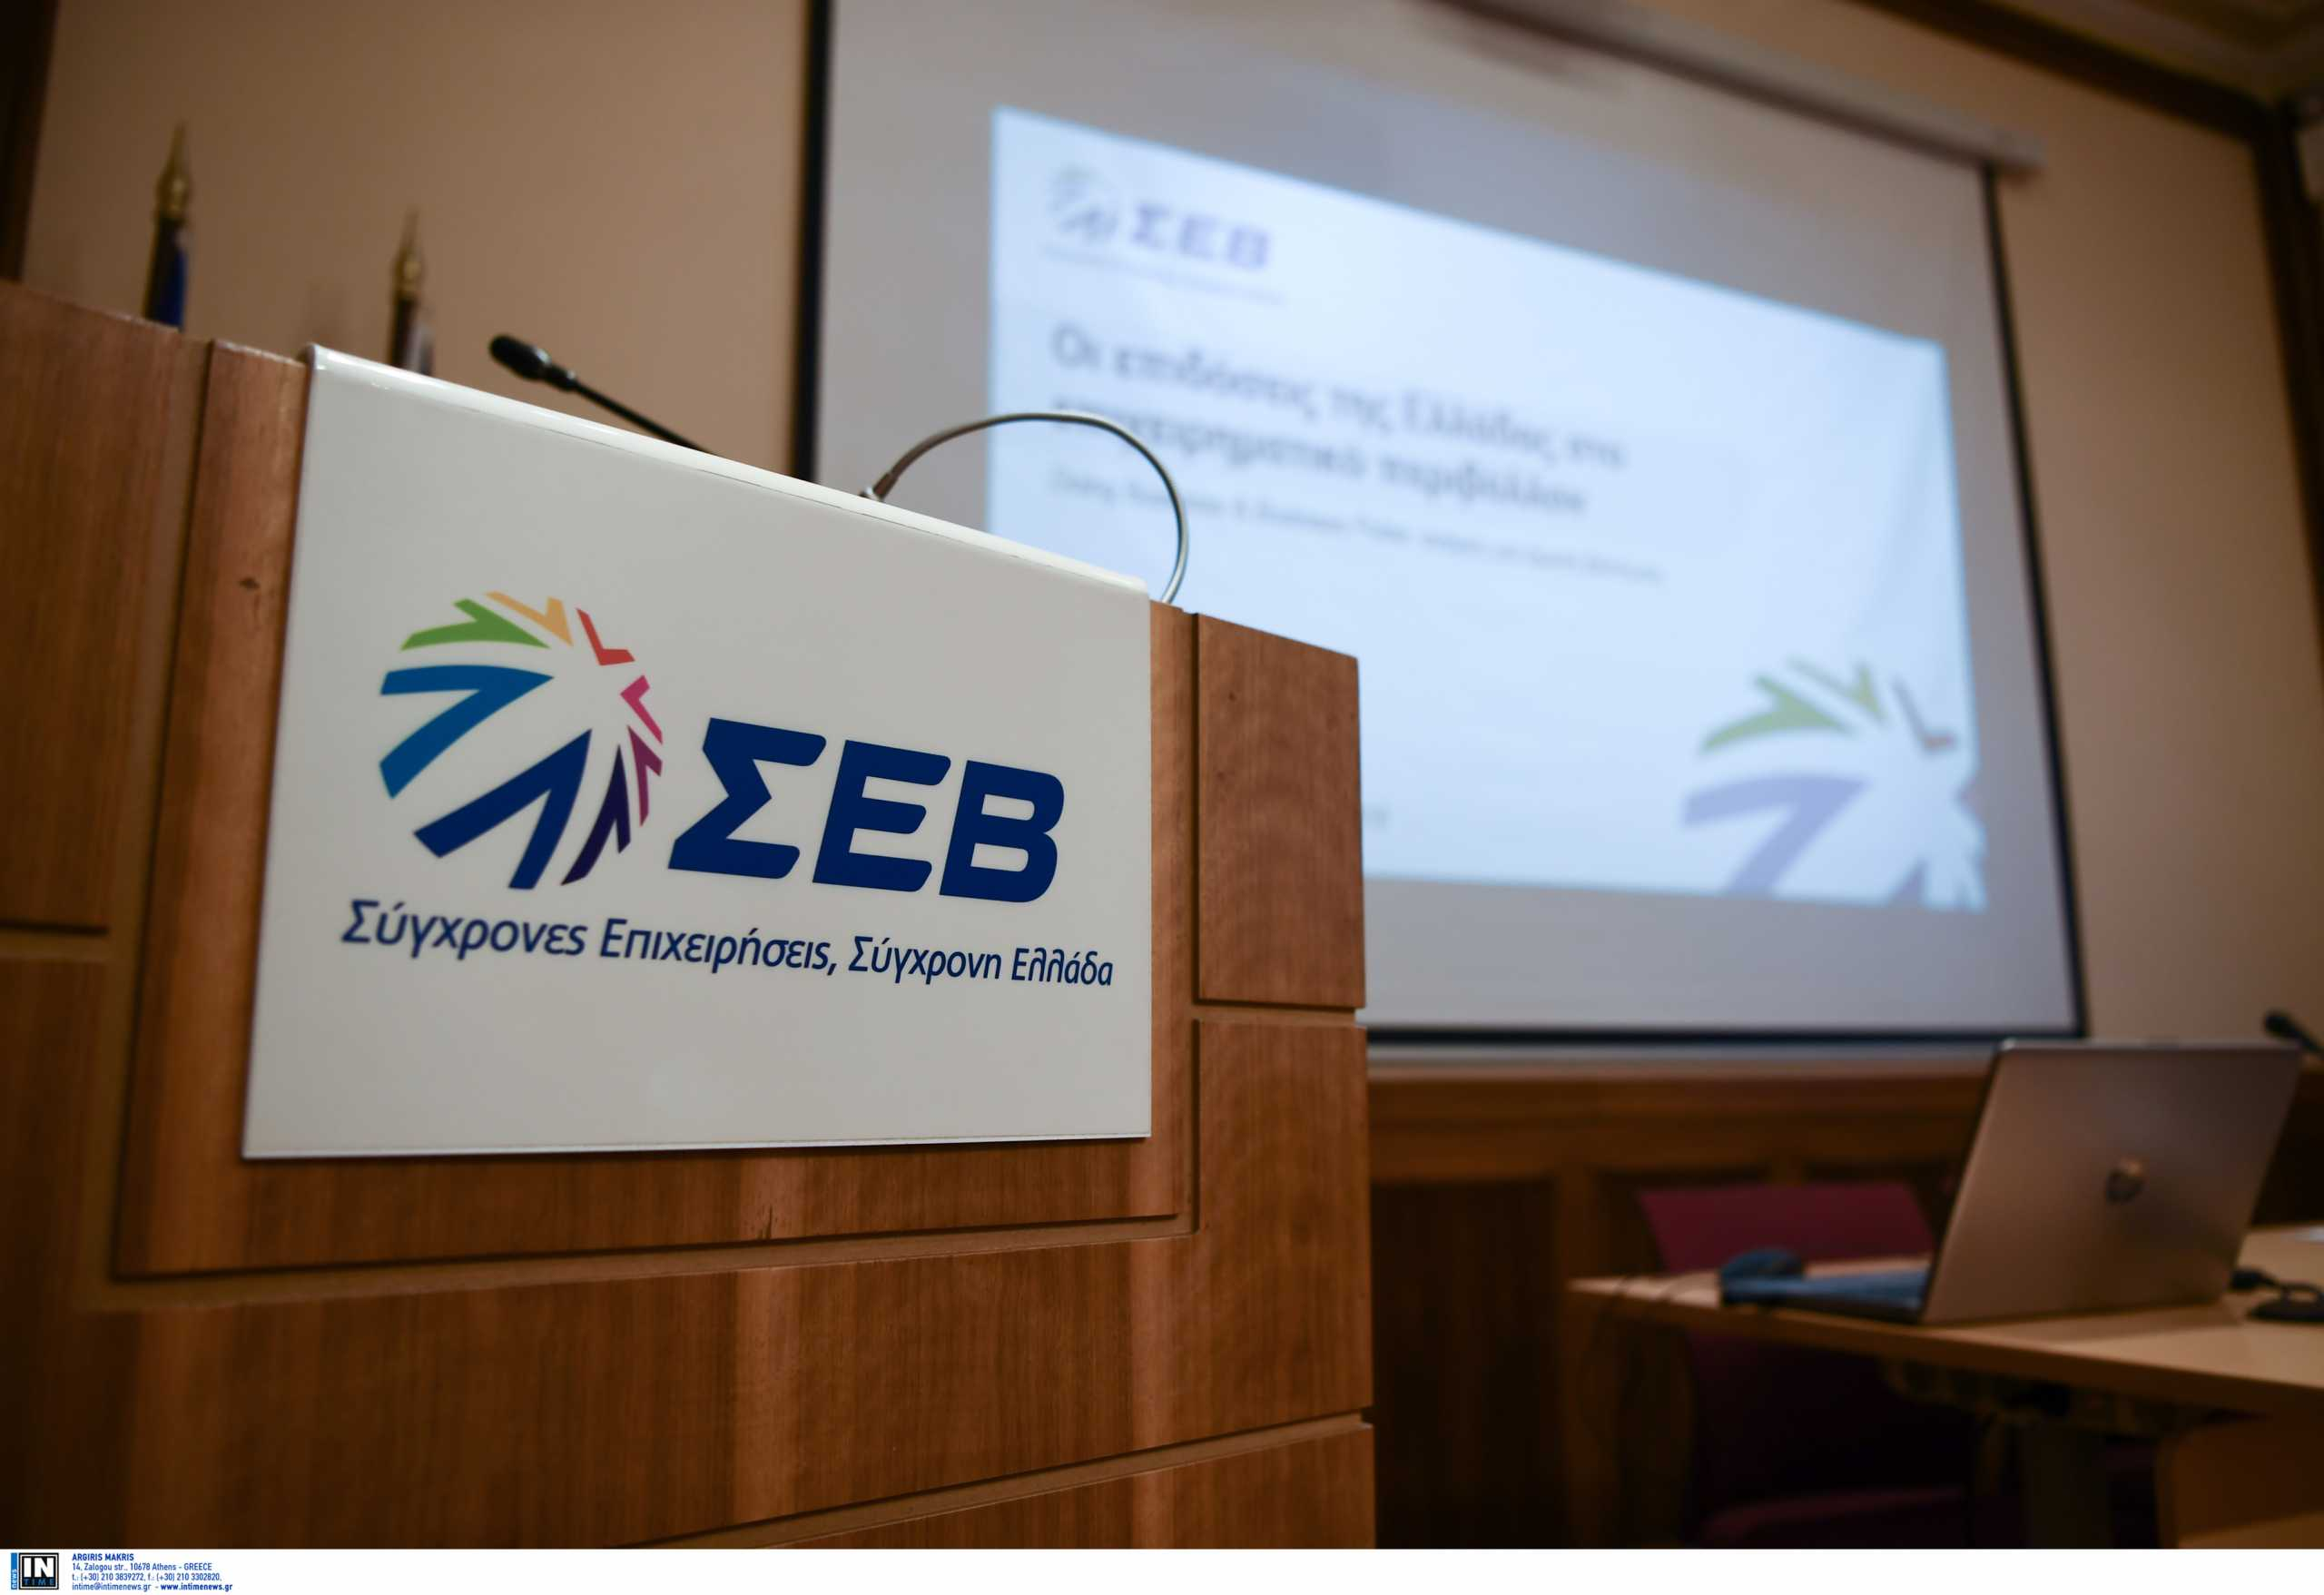 O ΣΕΒ στηρίζει τις νεοφυείς επιχειρήσεις με την πρωτοβουλία Innovation Ready